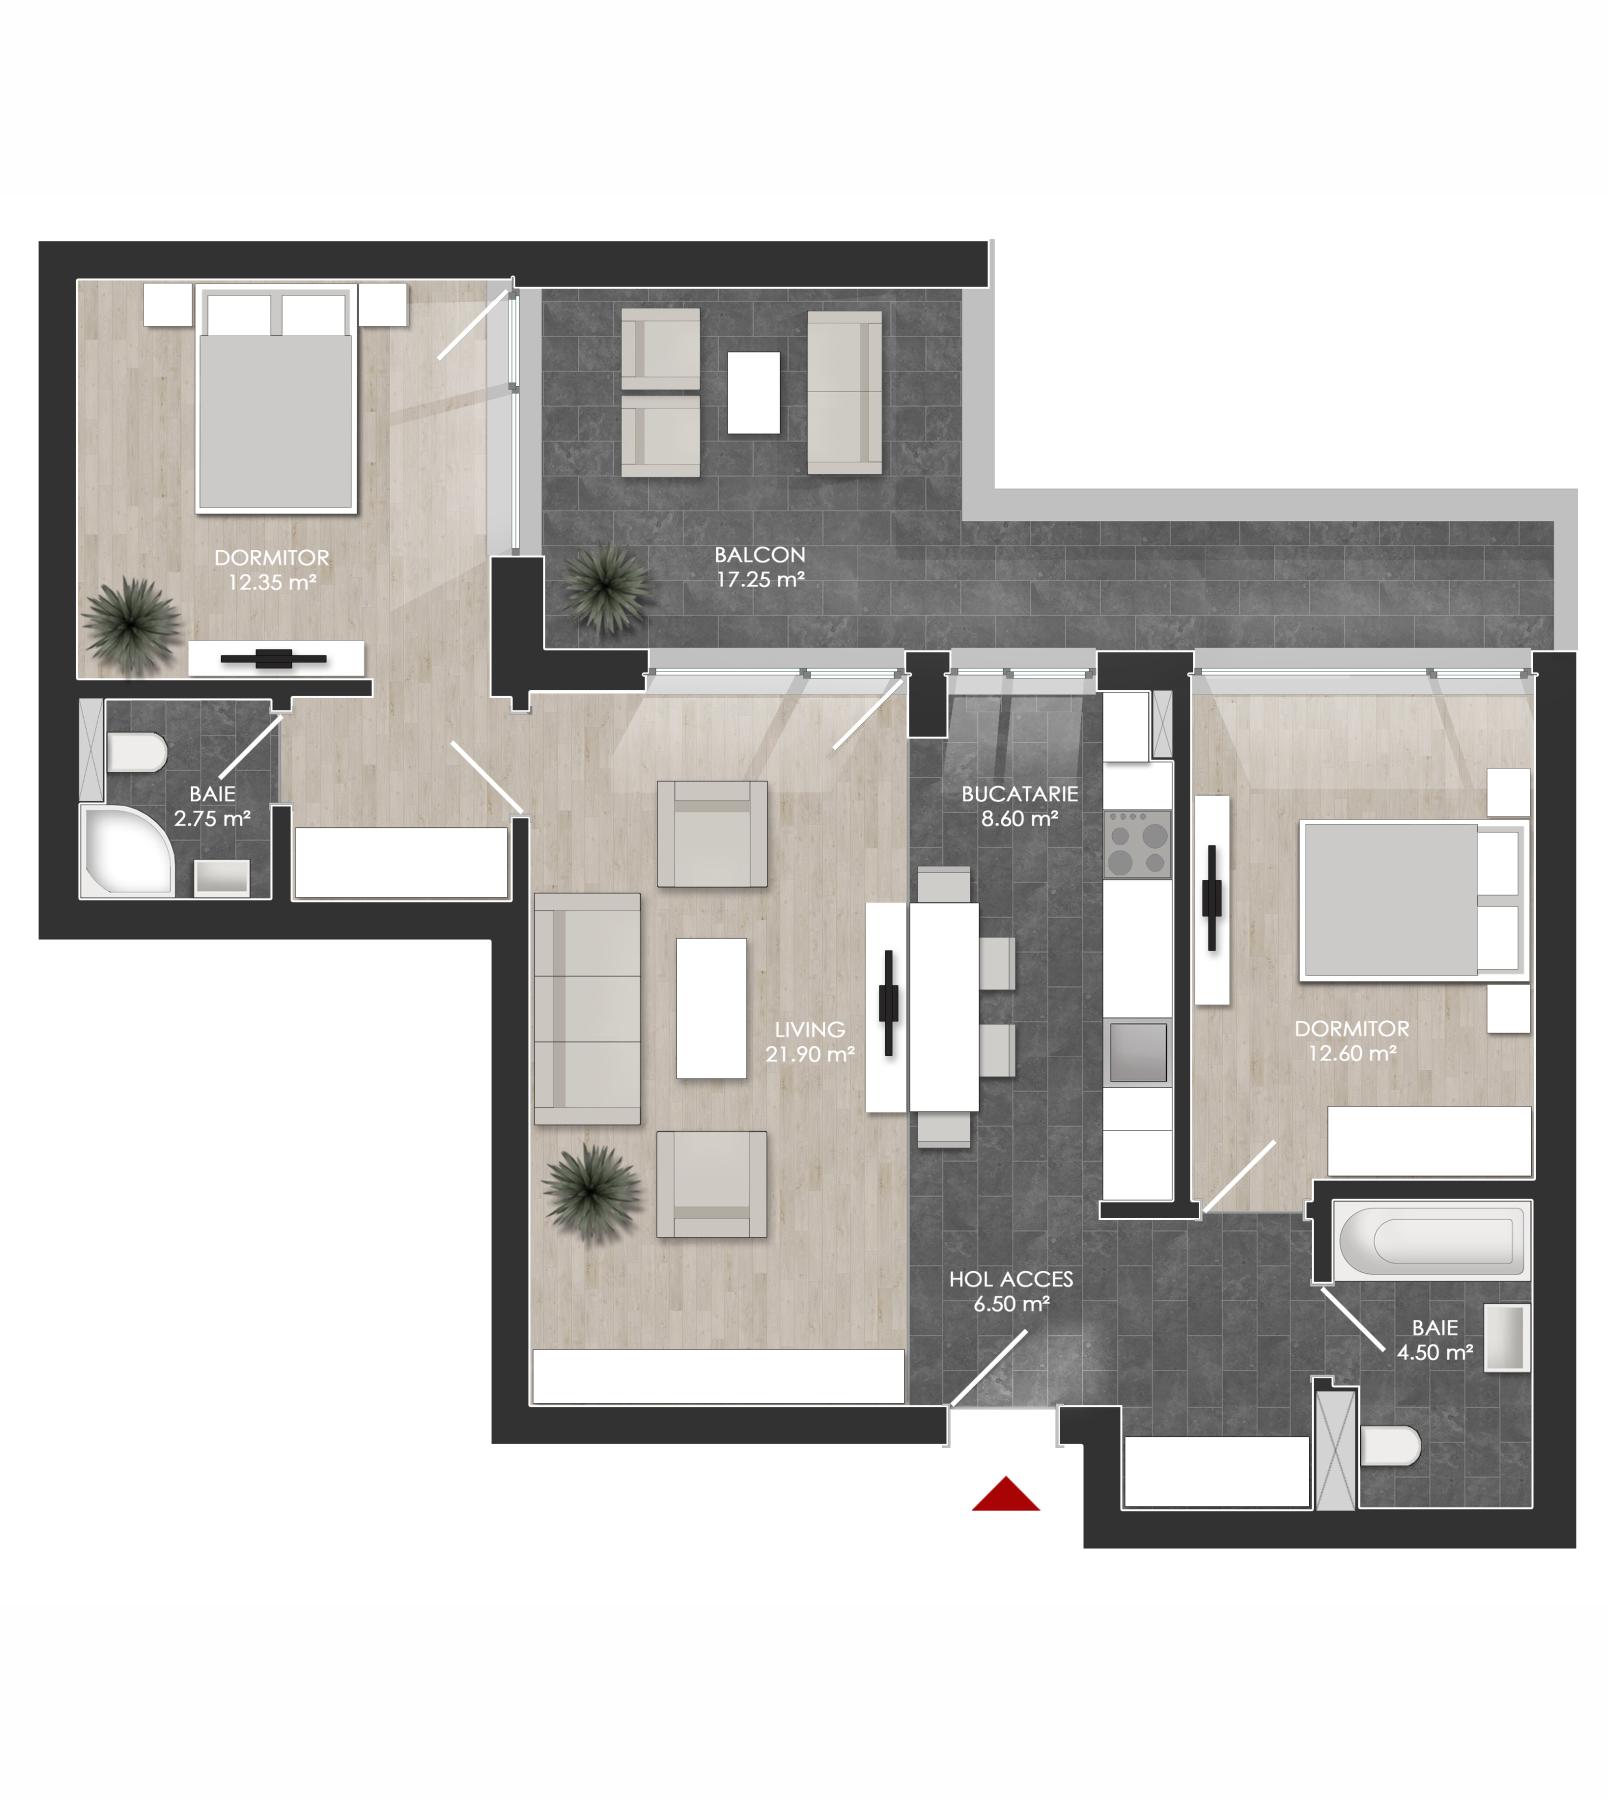 Apartament 3 camere tip 3E balcon   etaj 4   Cladire 1